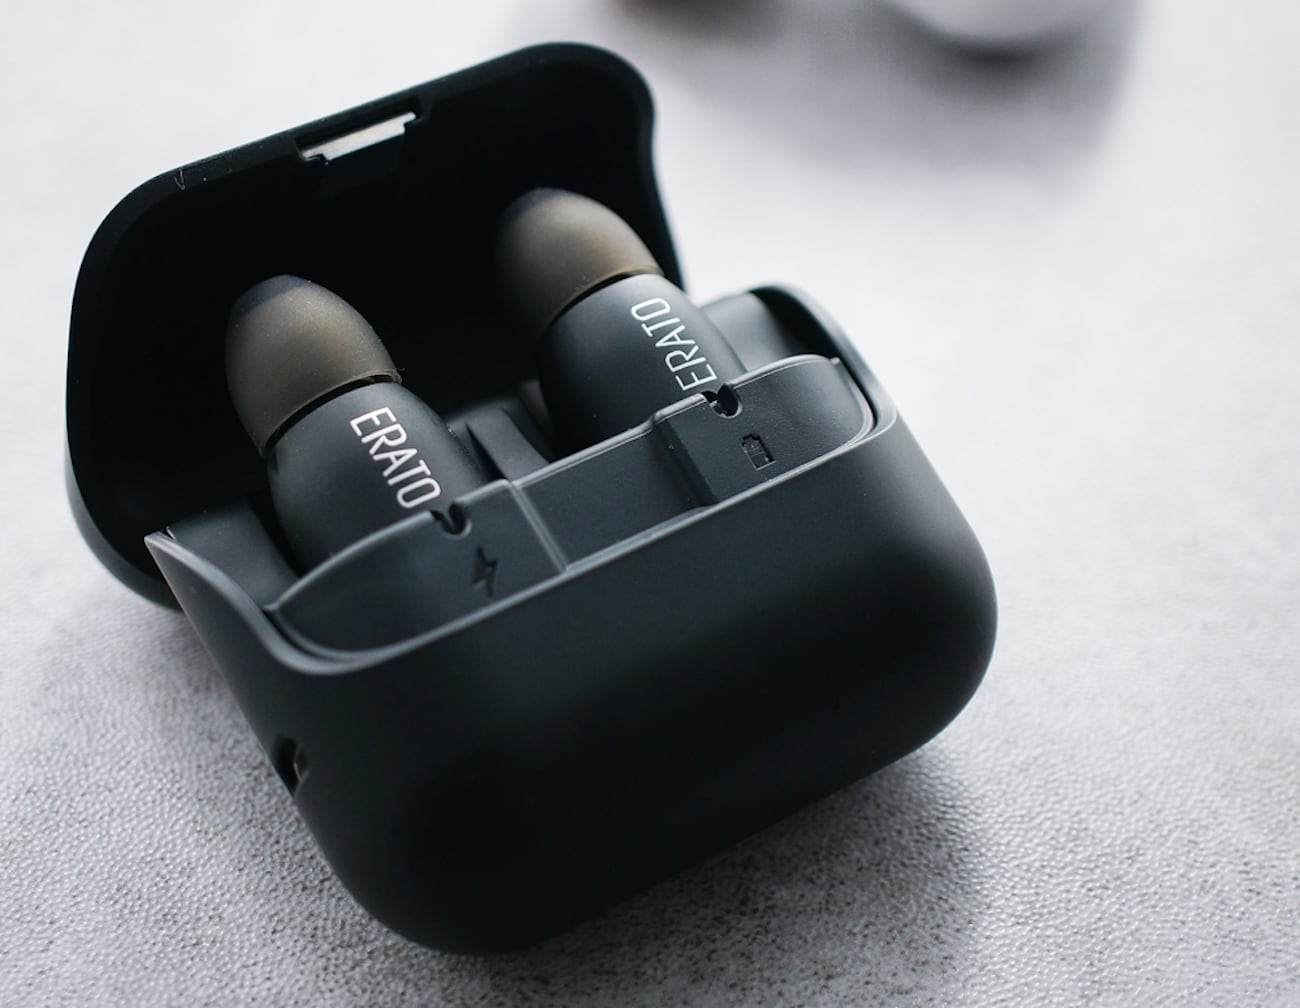 Erato Verse Wireless Earbuds